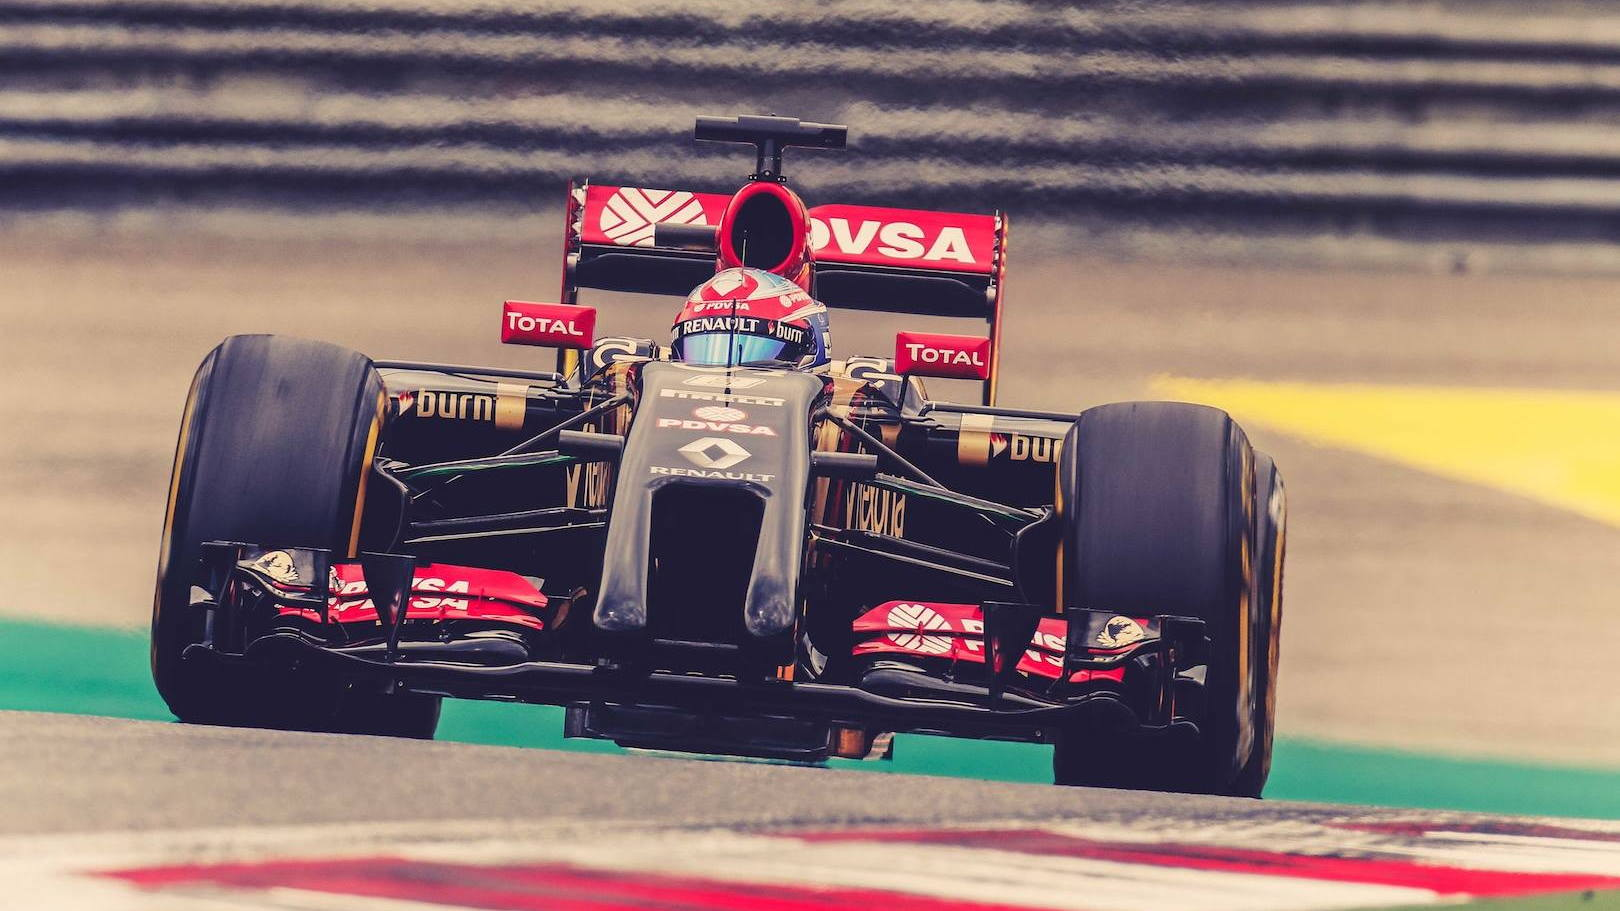 2014 Lotus E22 Formula One car (Lotus F1 Team Facebook)